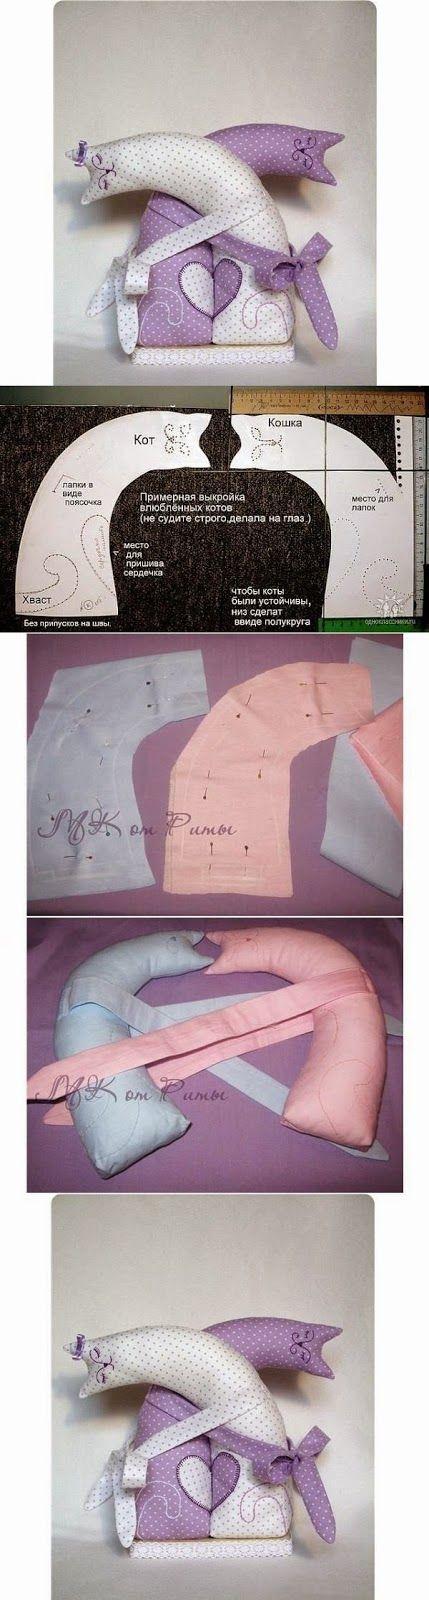 Fermaporta e pupazzi di stoffa fai da te - Tutorial e cartamodelli gratis